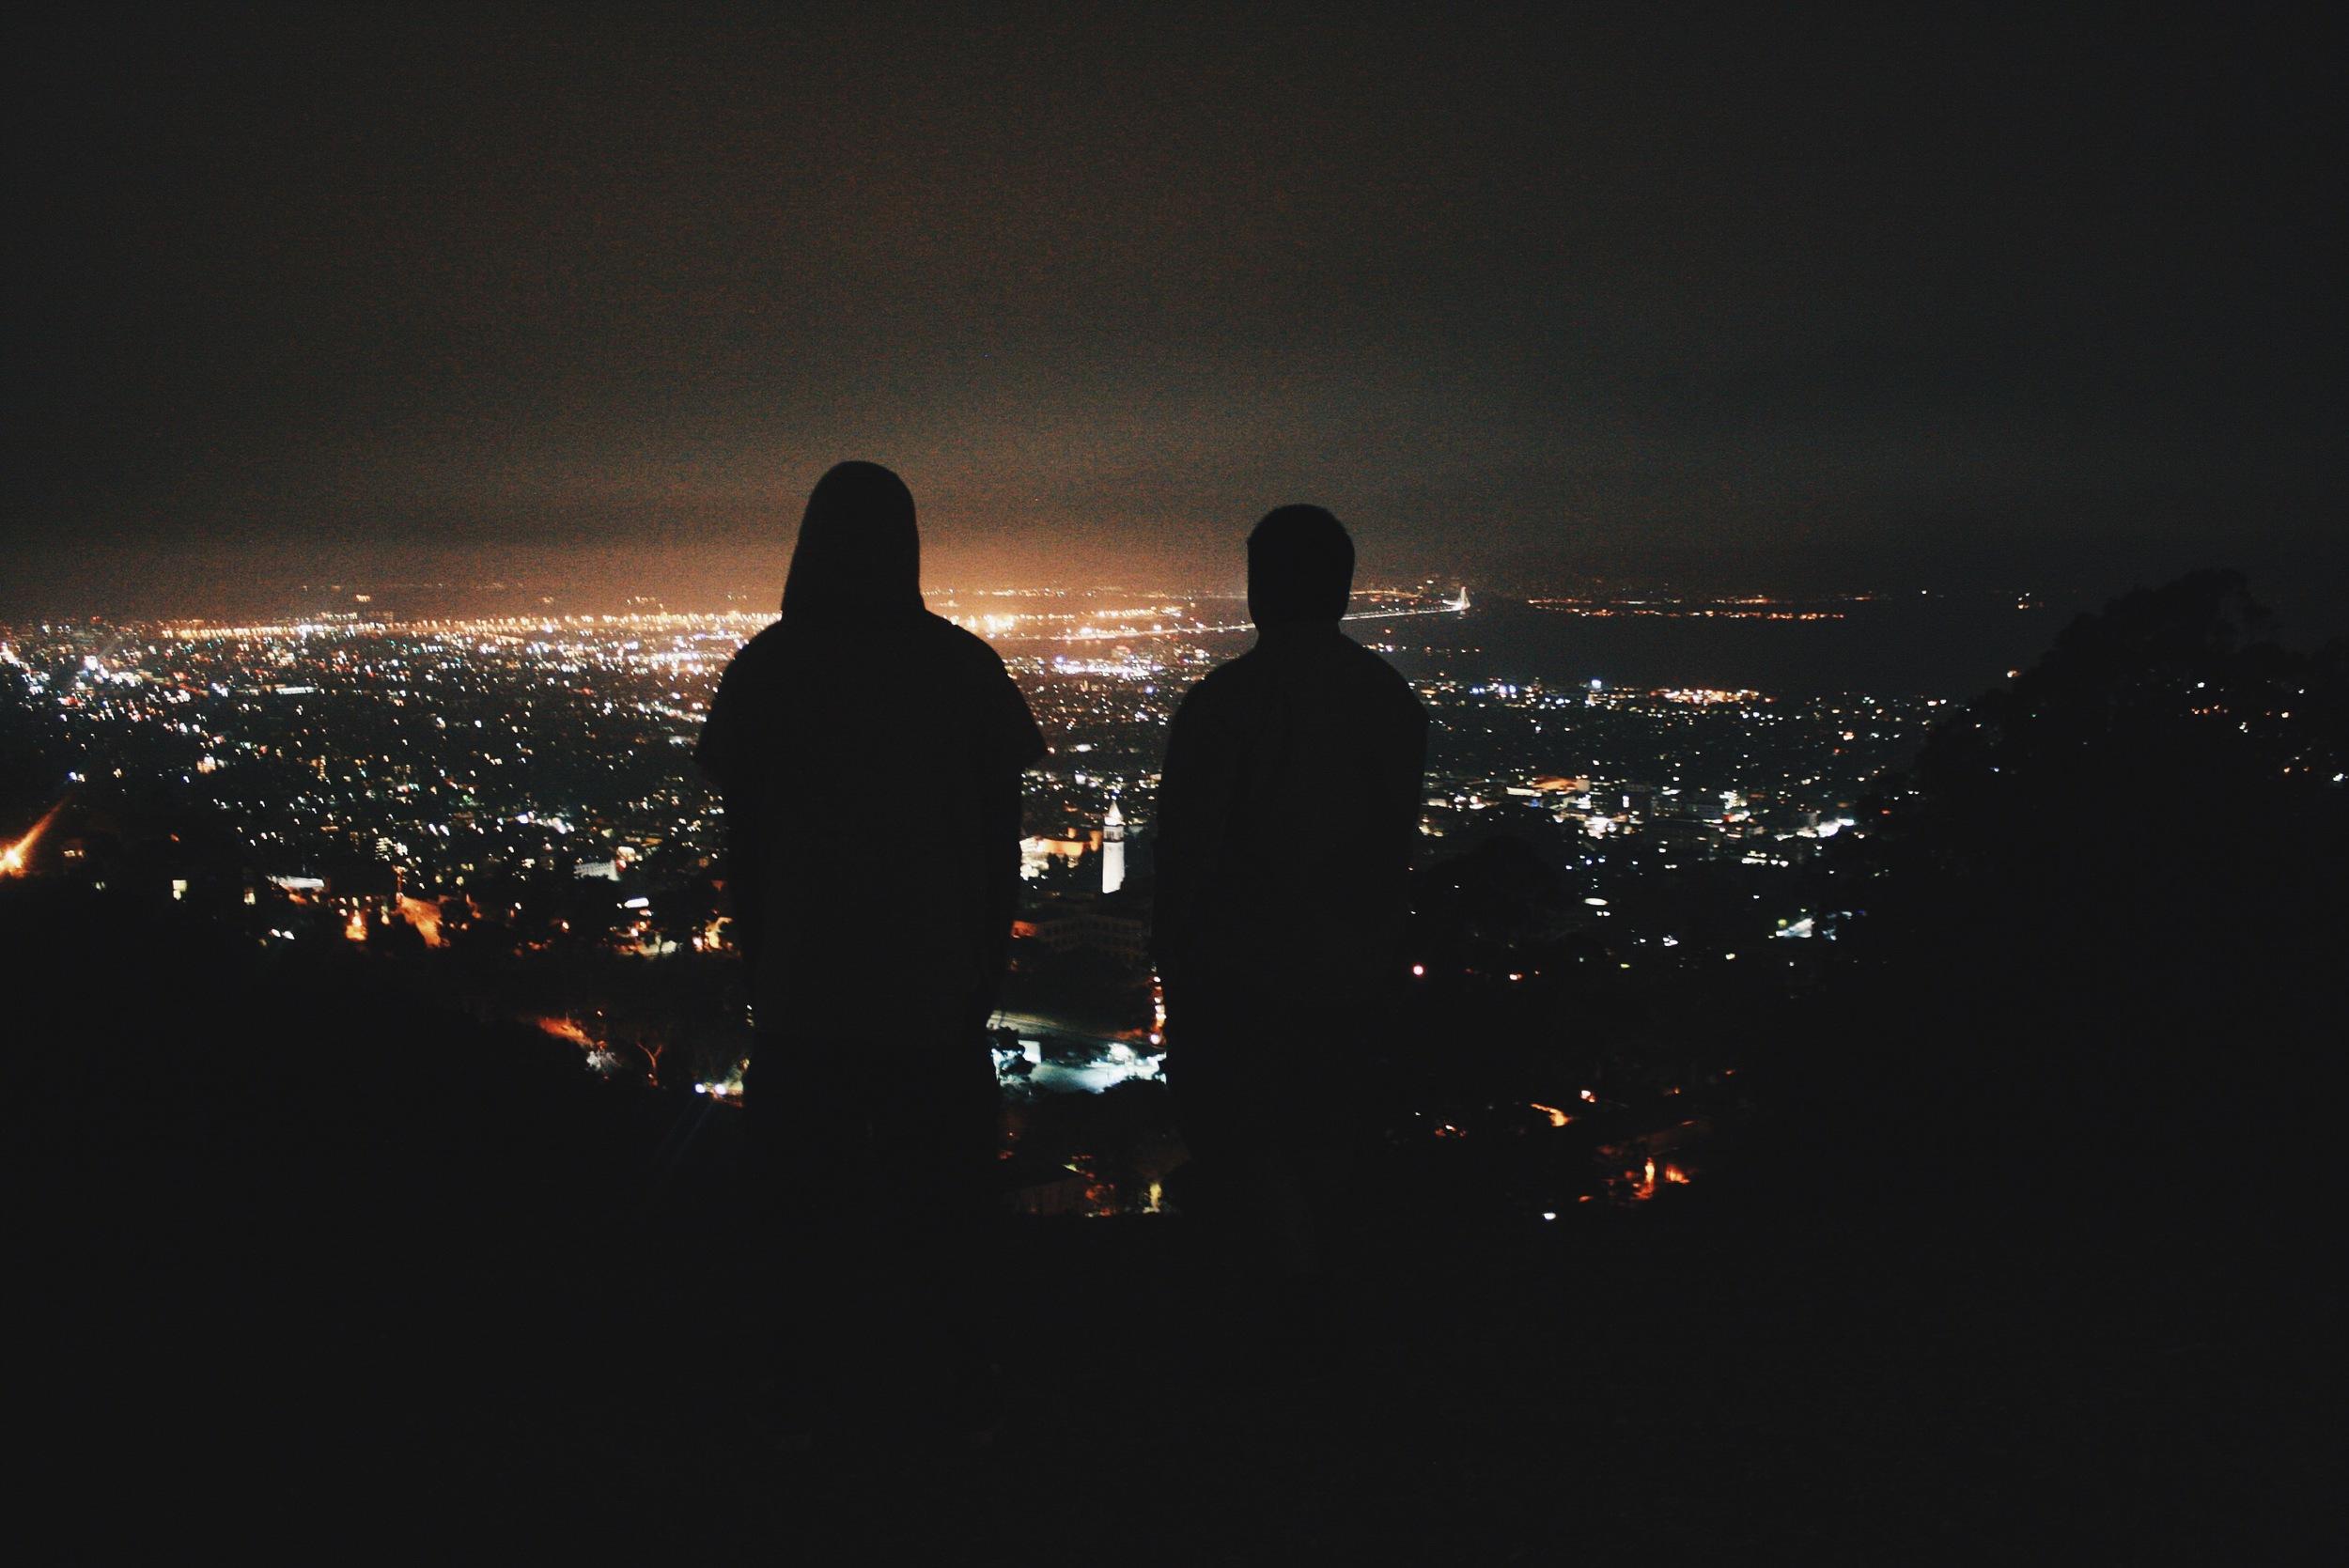 Observatory at UC Berkeley